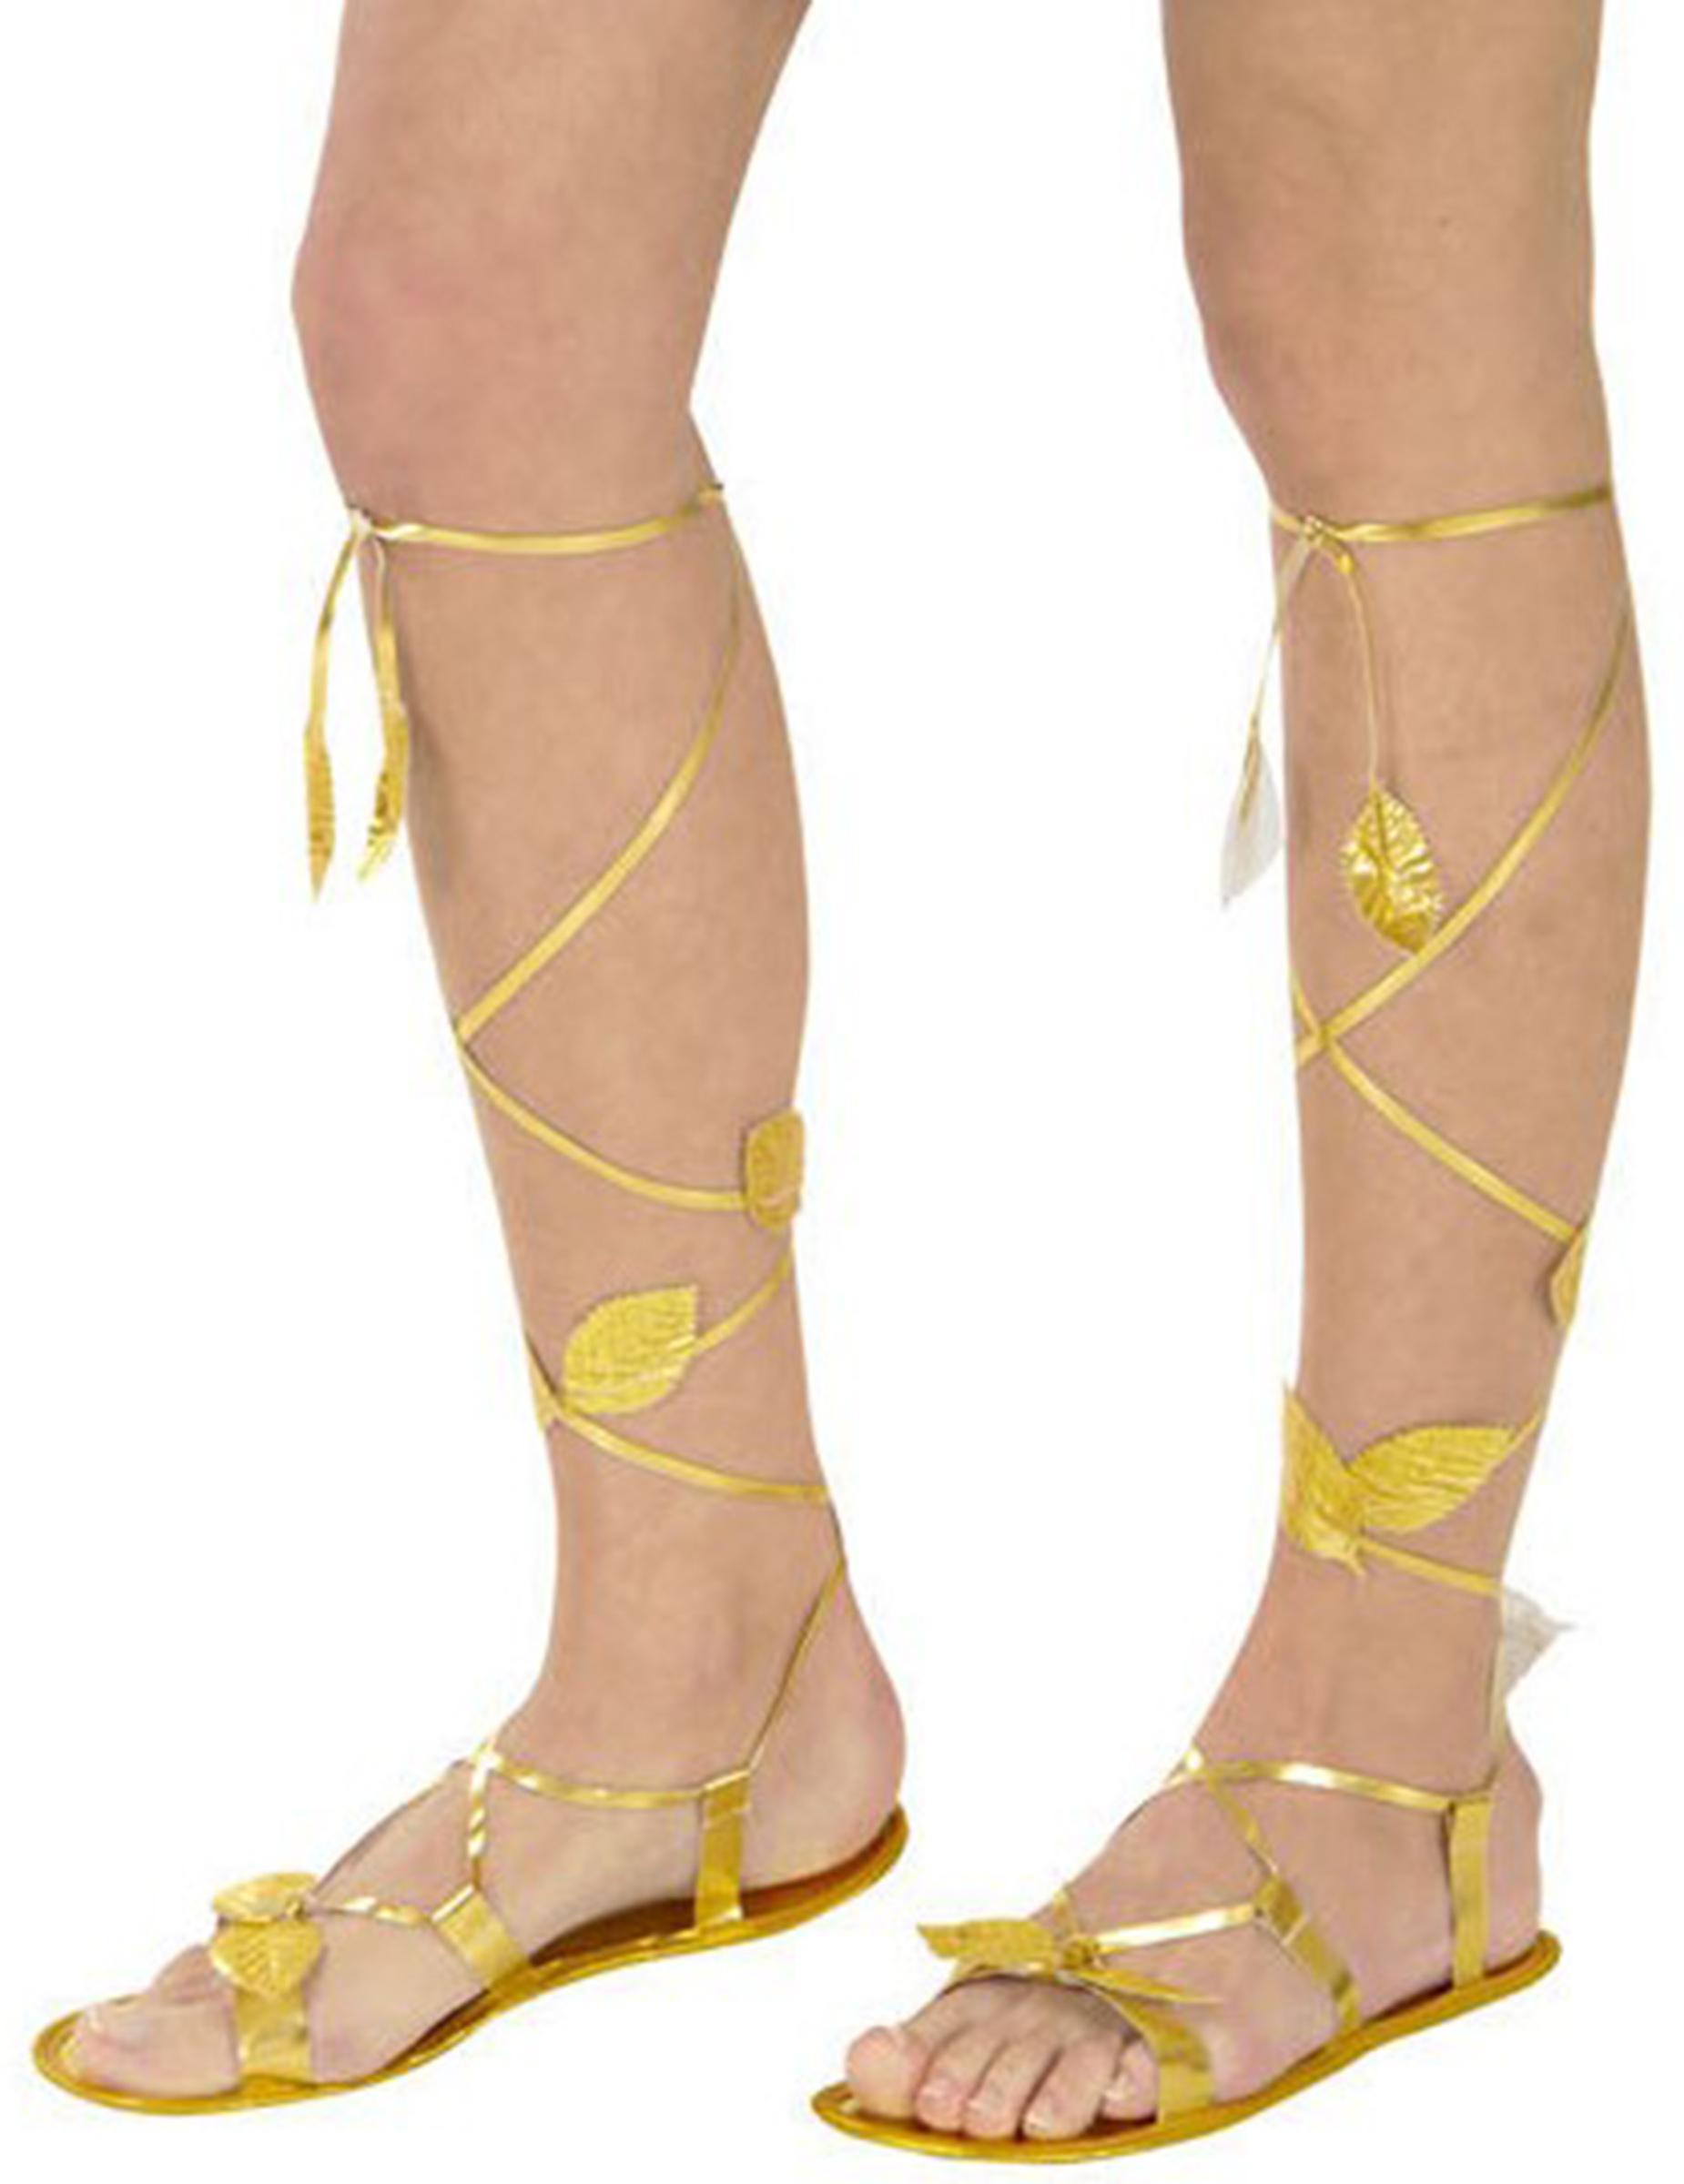 04c6458bf Sandálias douradas adulto: Acessórios,mascarilhas e fatos de ...